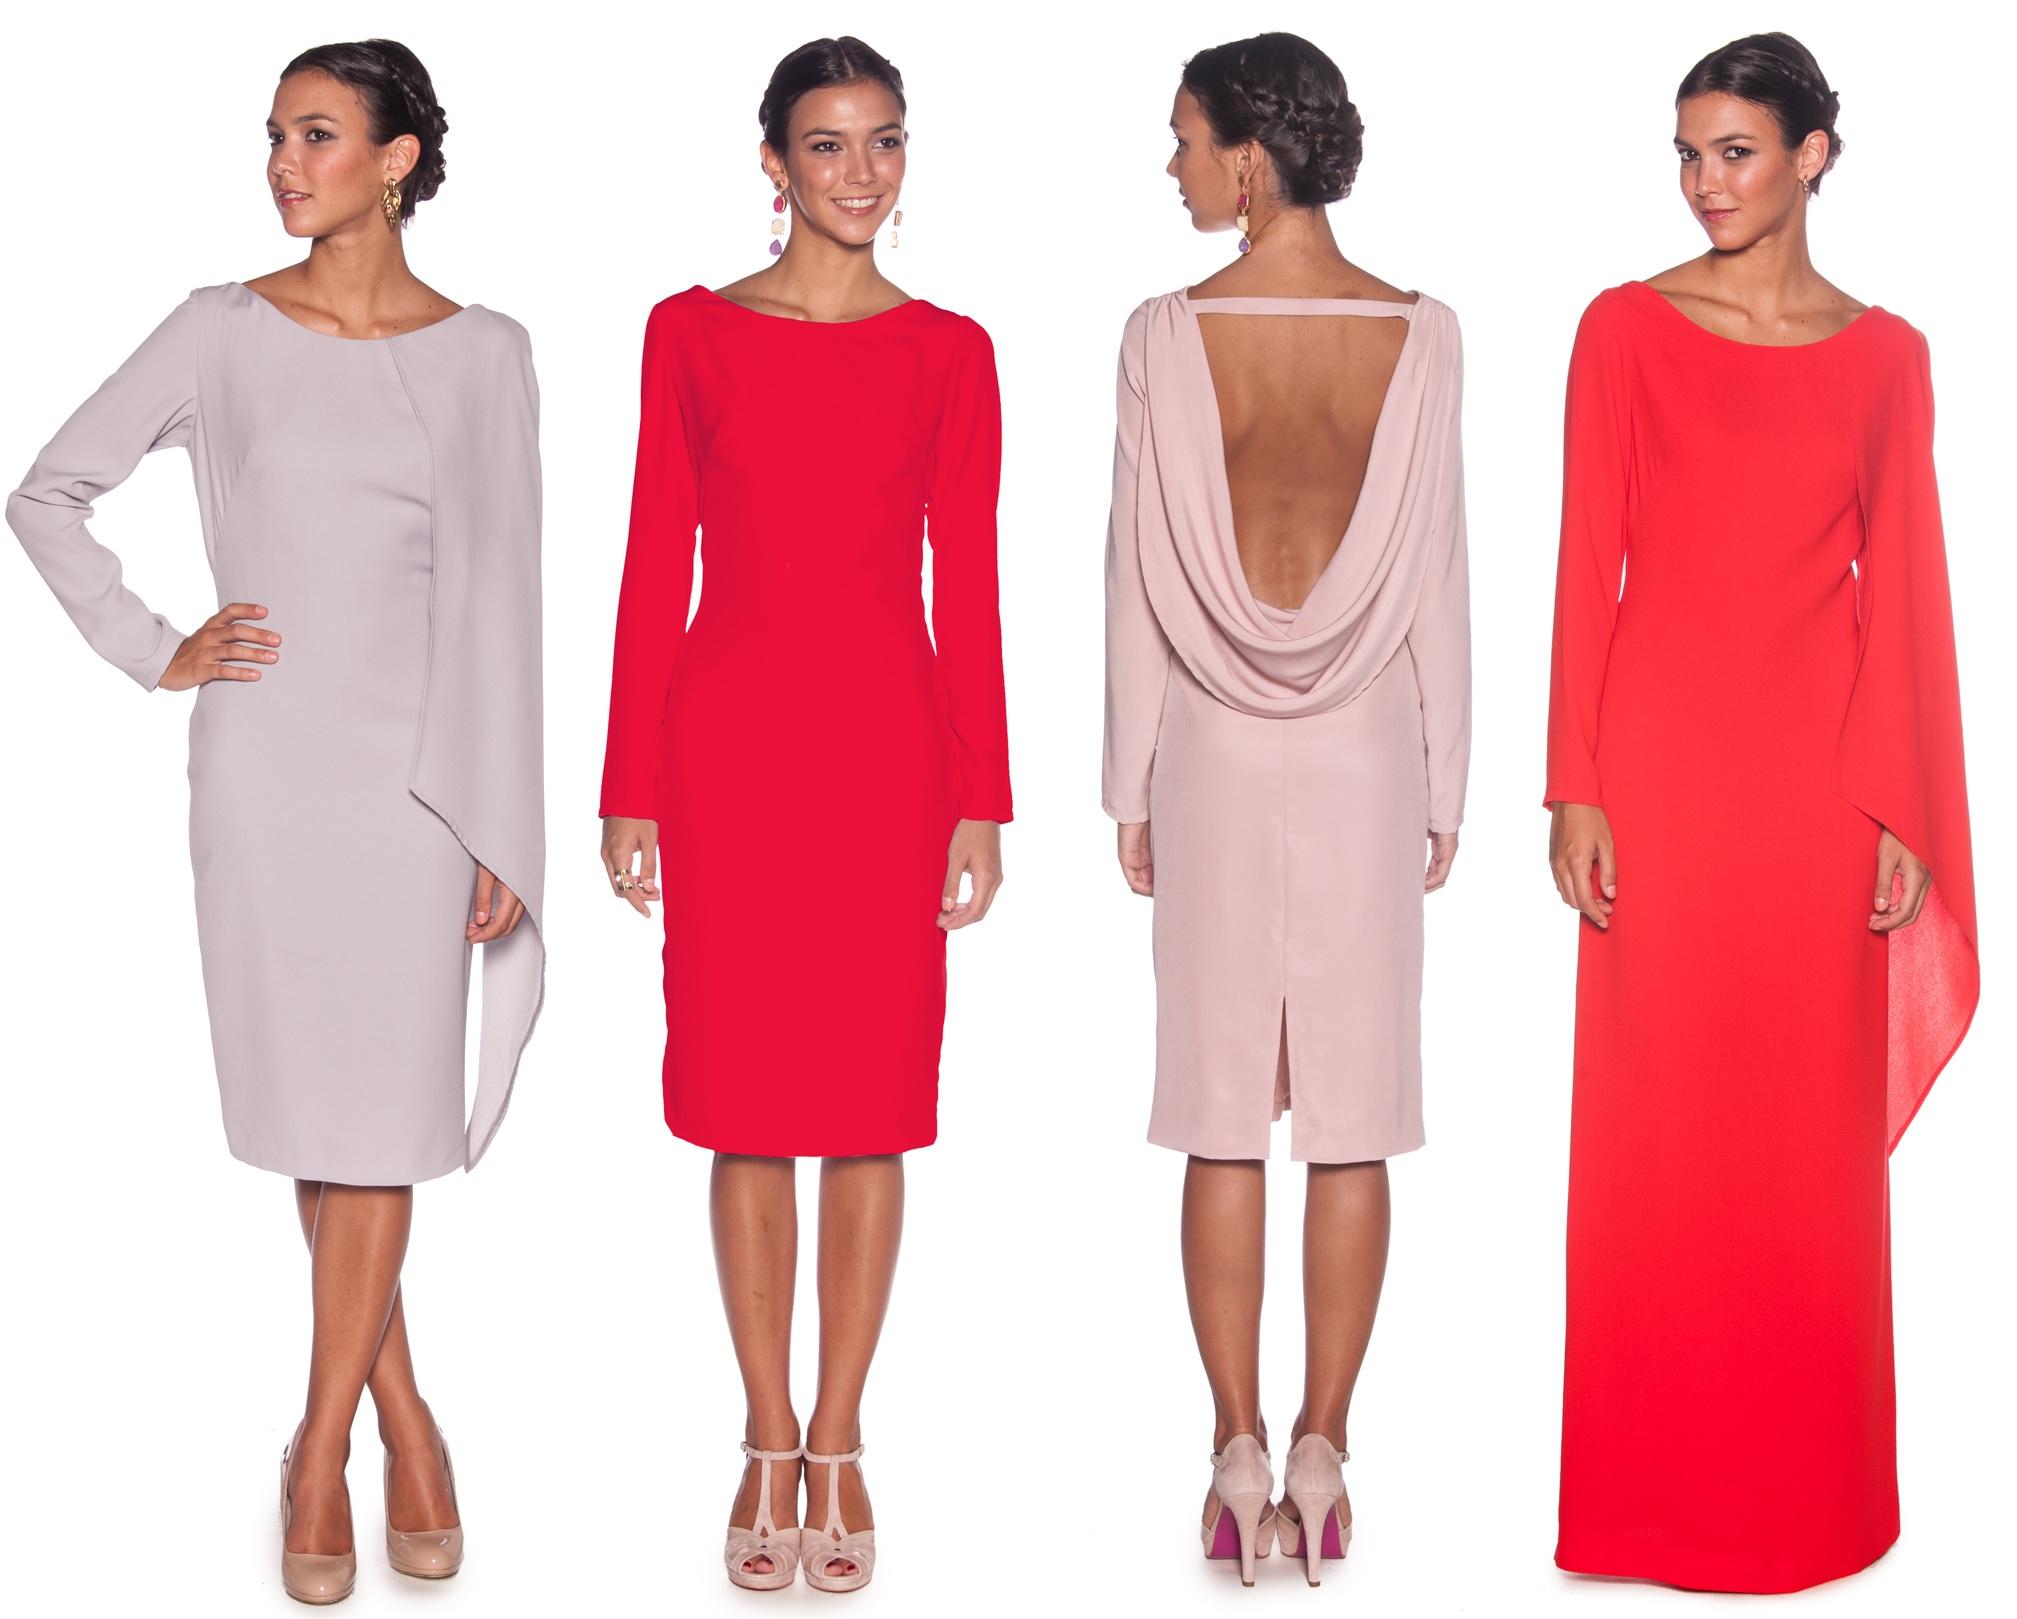 vestidos de manga larga de lamasmona.com